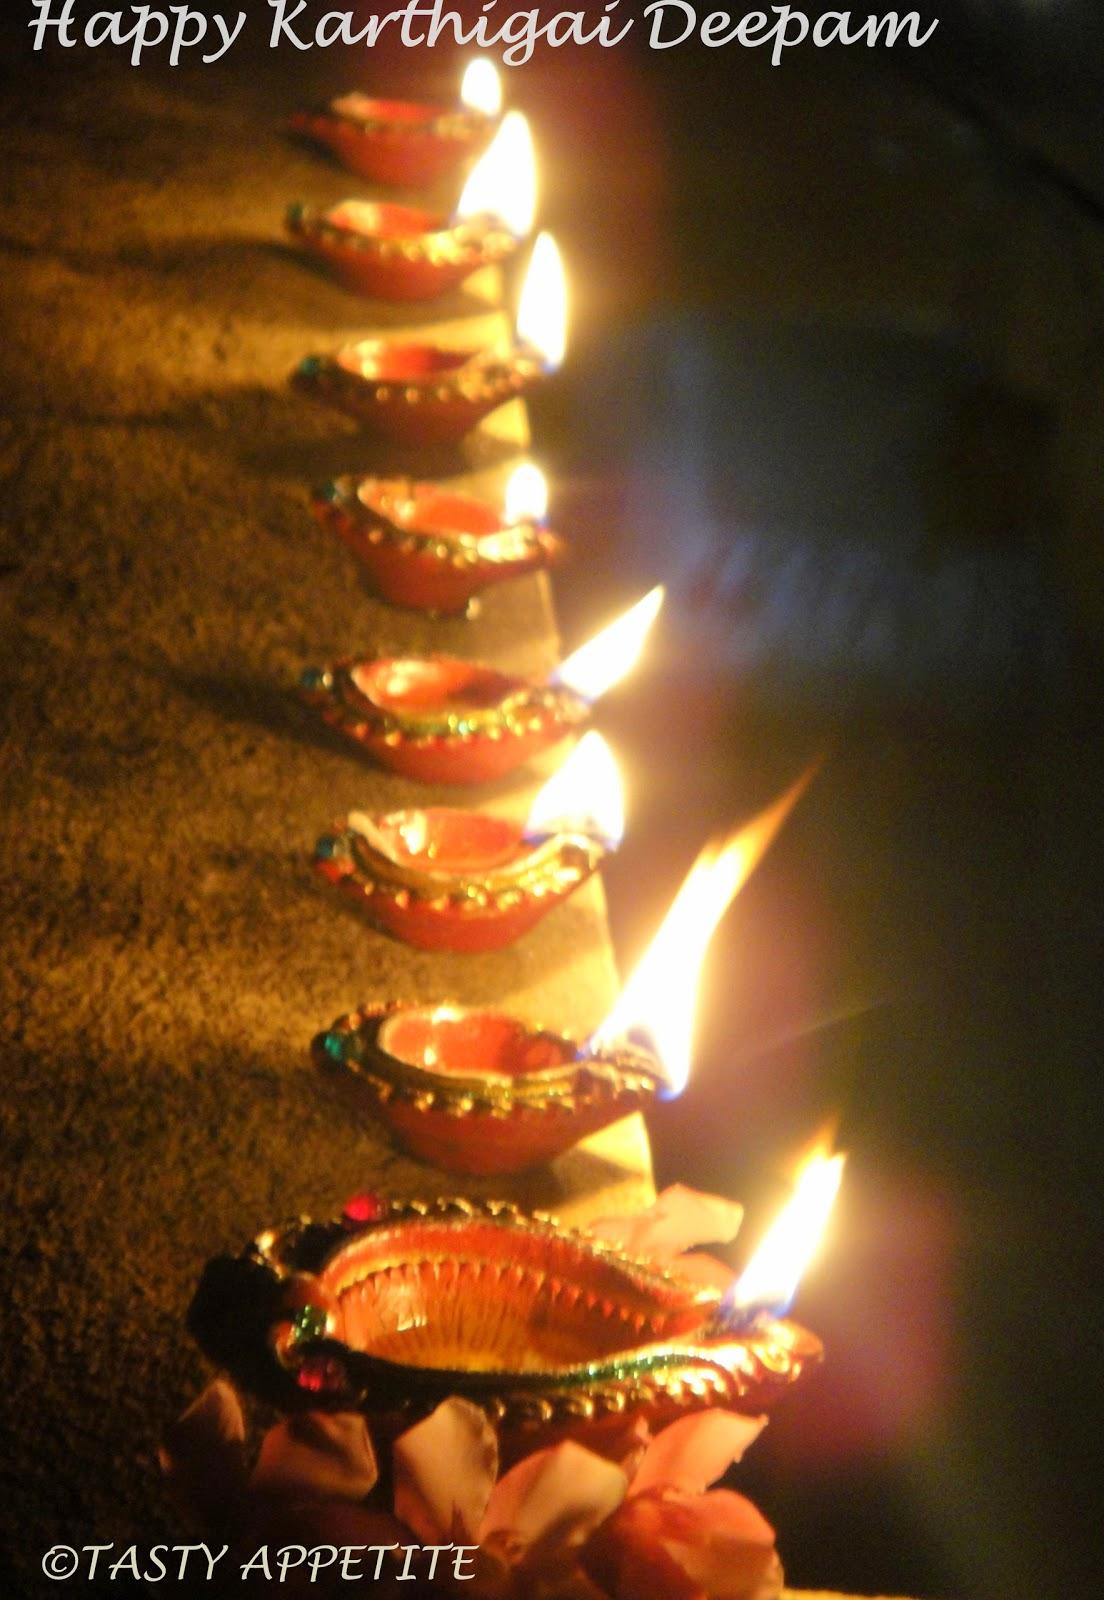 Happy Karthigai Deepam Karthigai Deepam Wishes